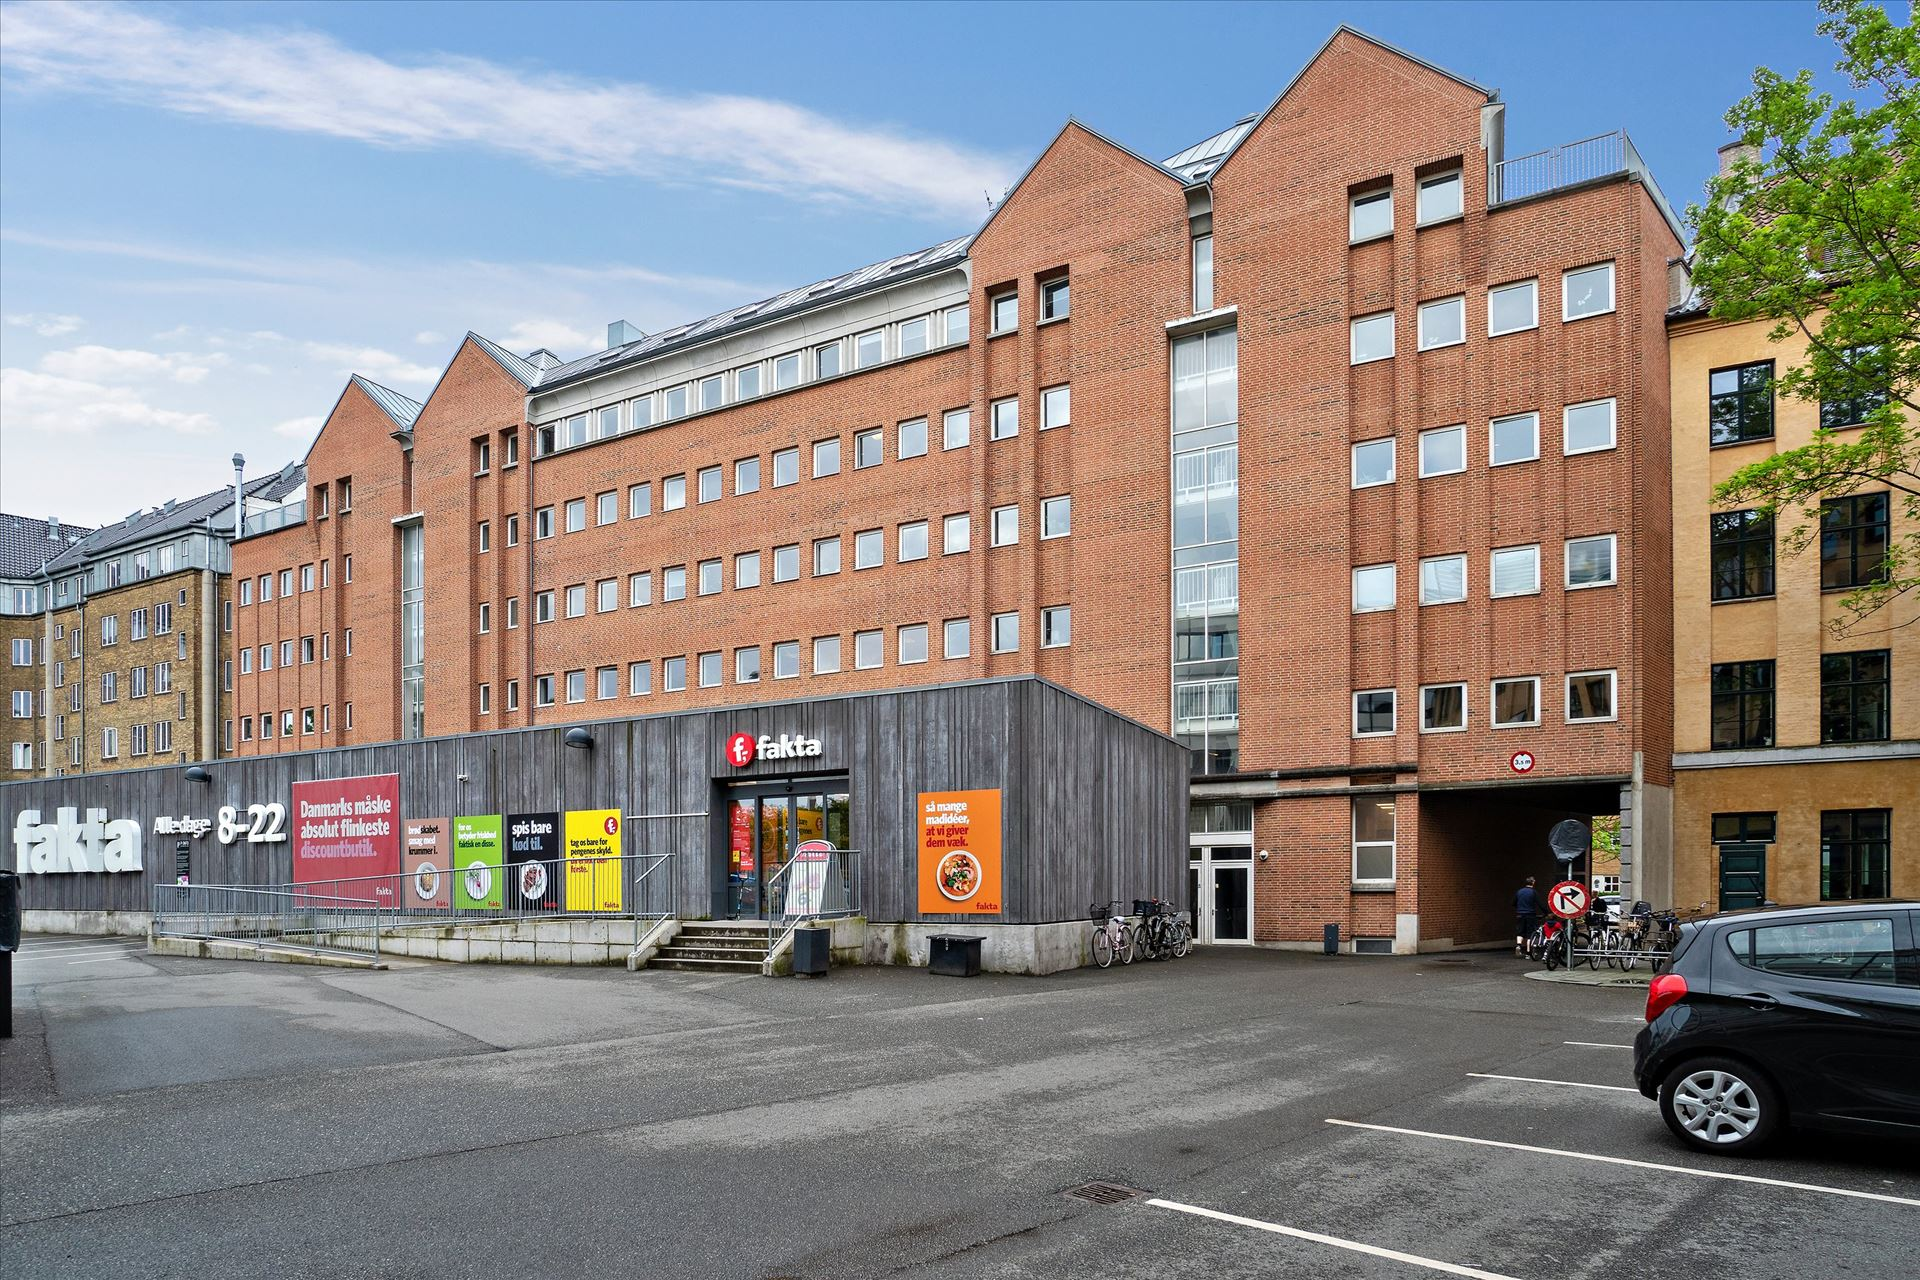 152 m² lager på Frederiksberg